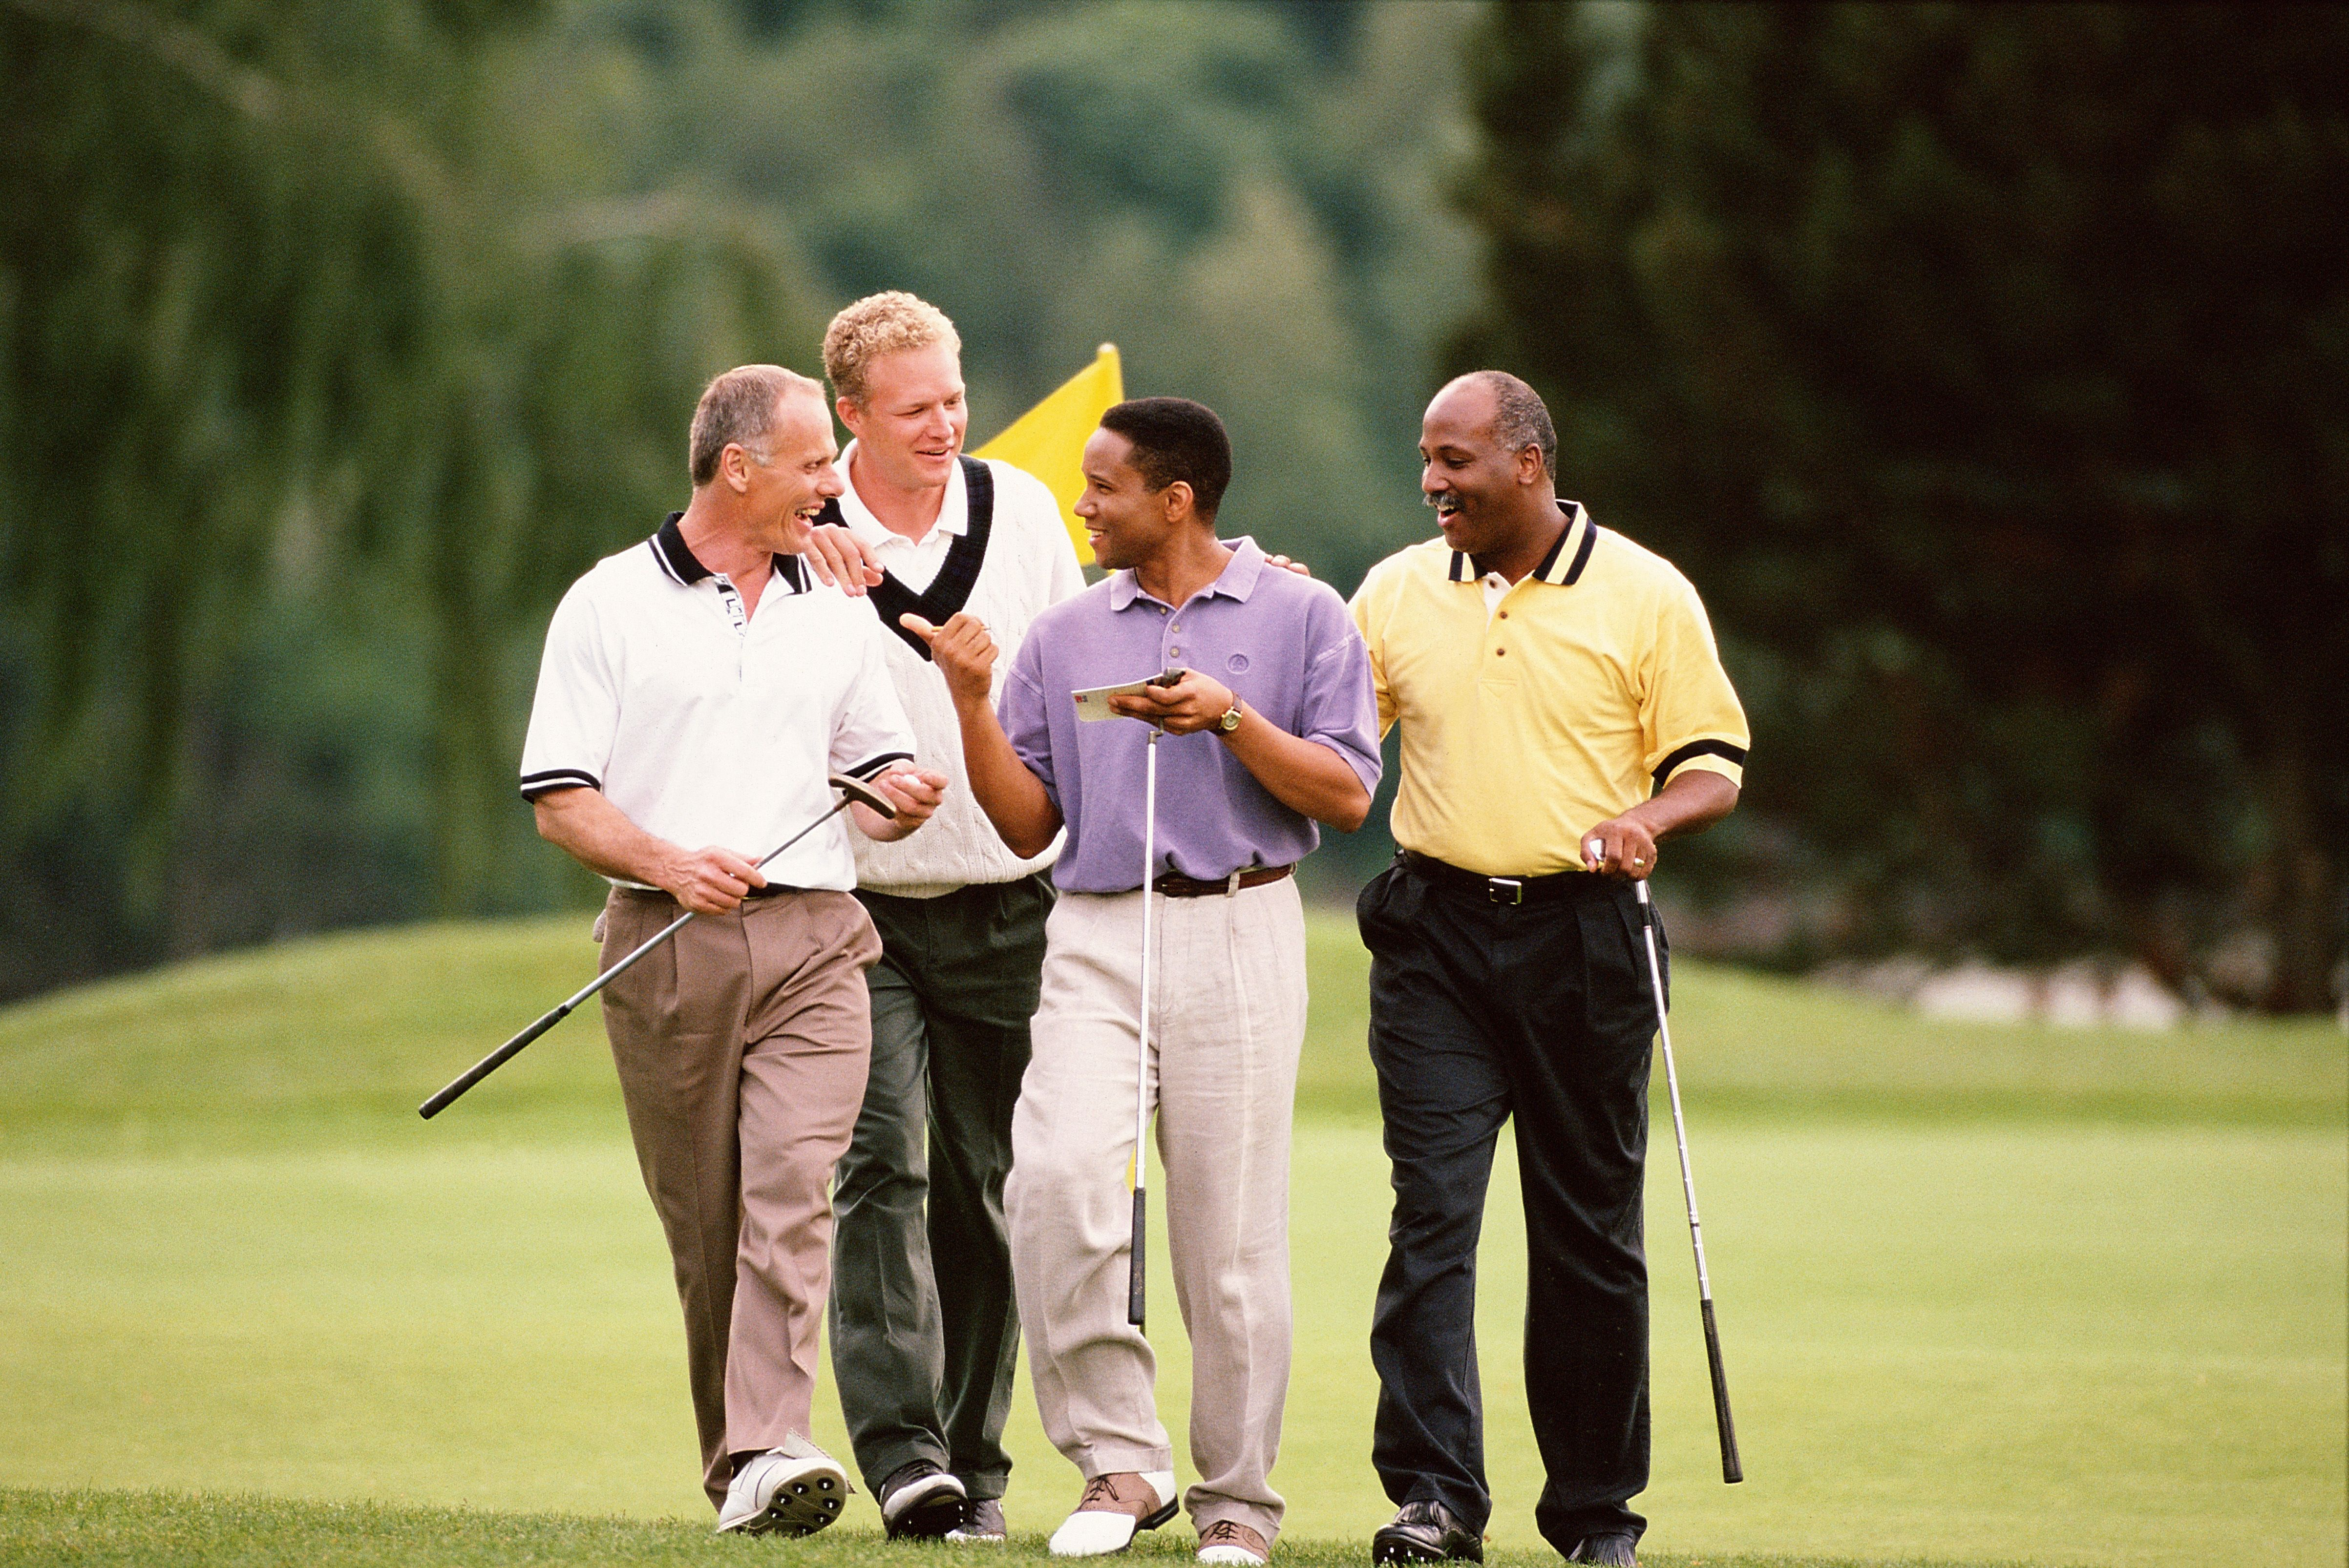 find golf demo days near you event locator